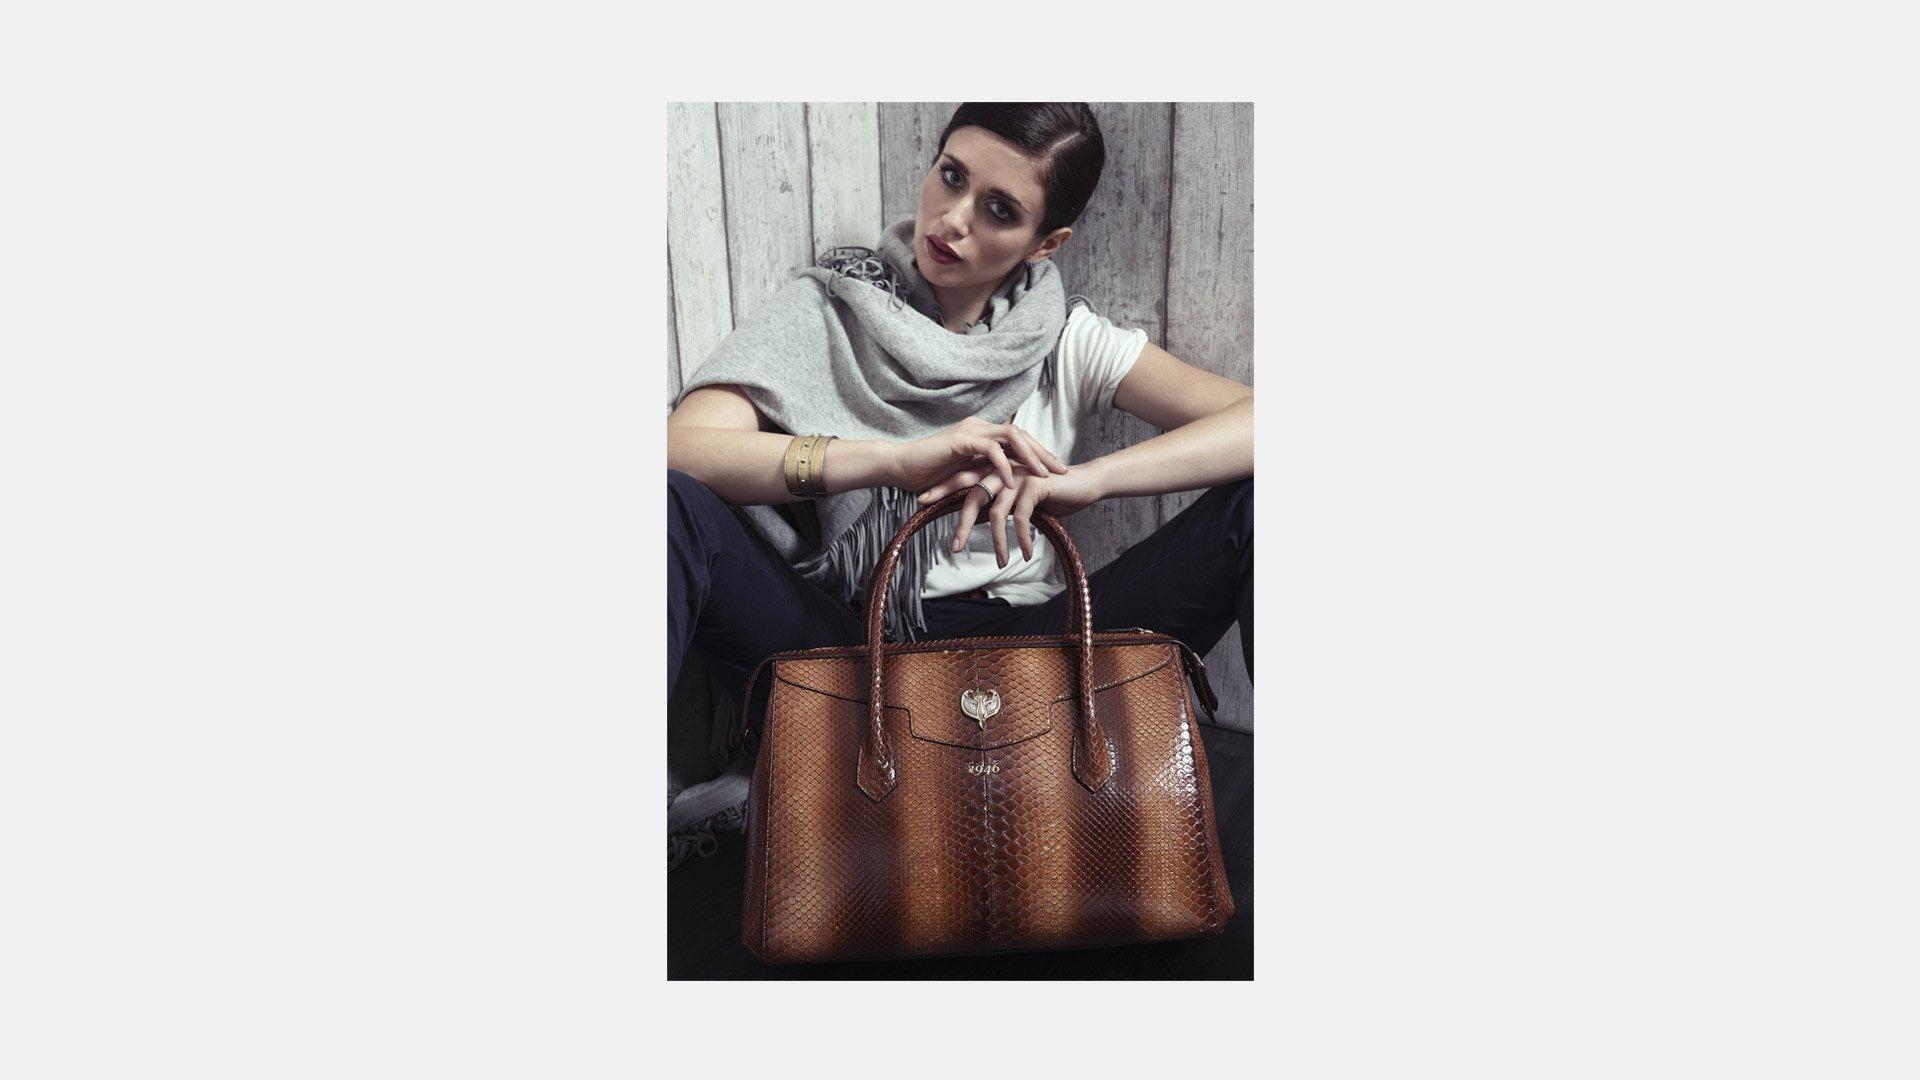 Bianchi e Nardi Pellegrini e Costache Fashion Photography and Film Production Birmingham London UK